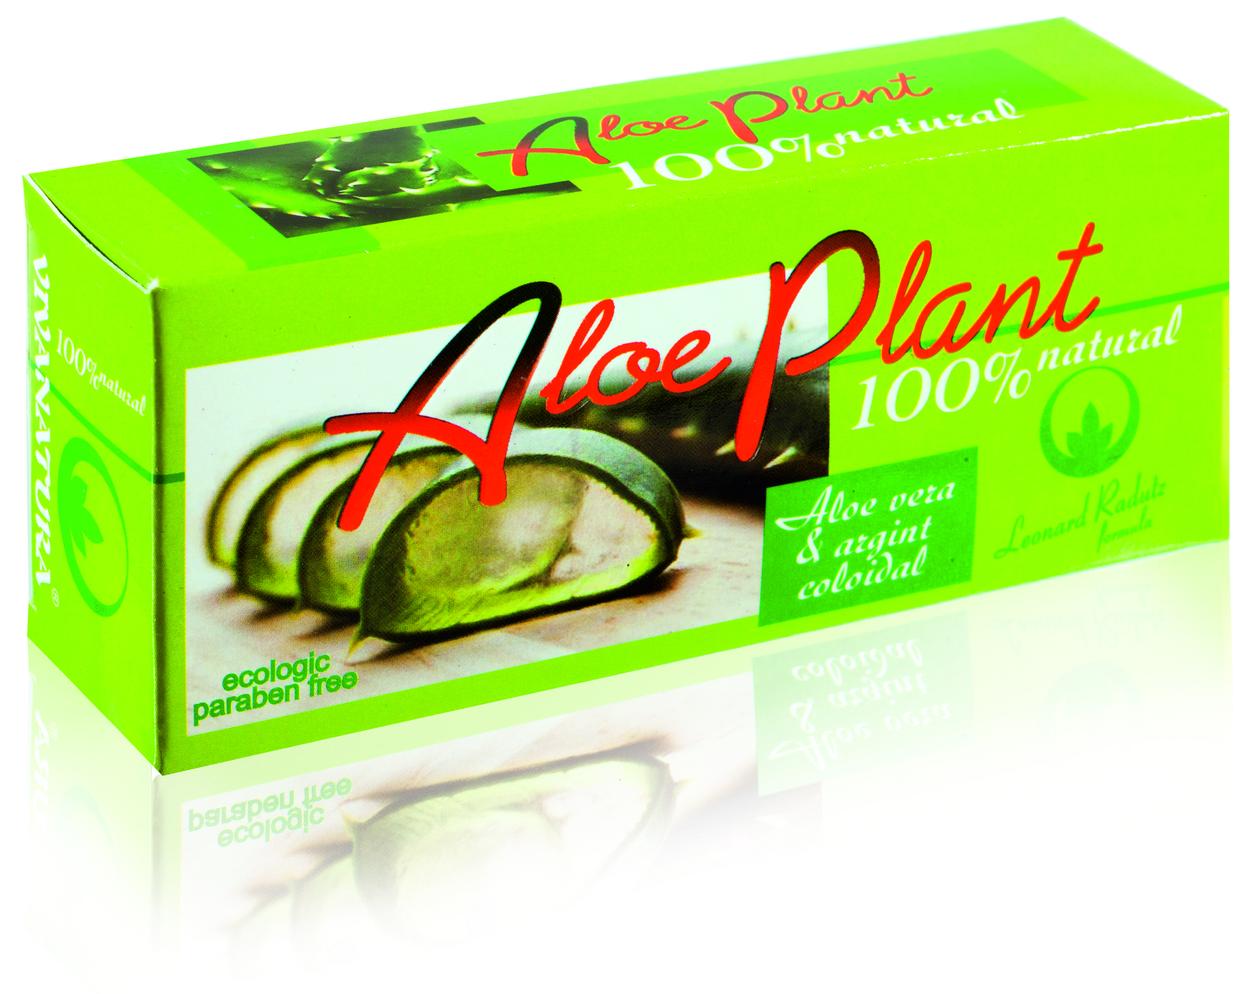 VivaNatura – AloePlant – Gel cu Aloe vera & argint coloidal